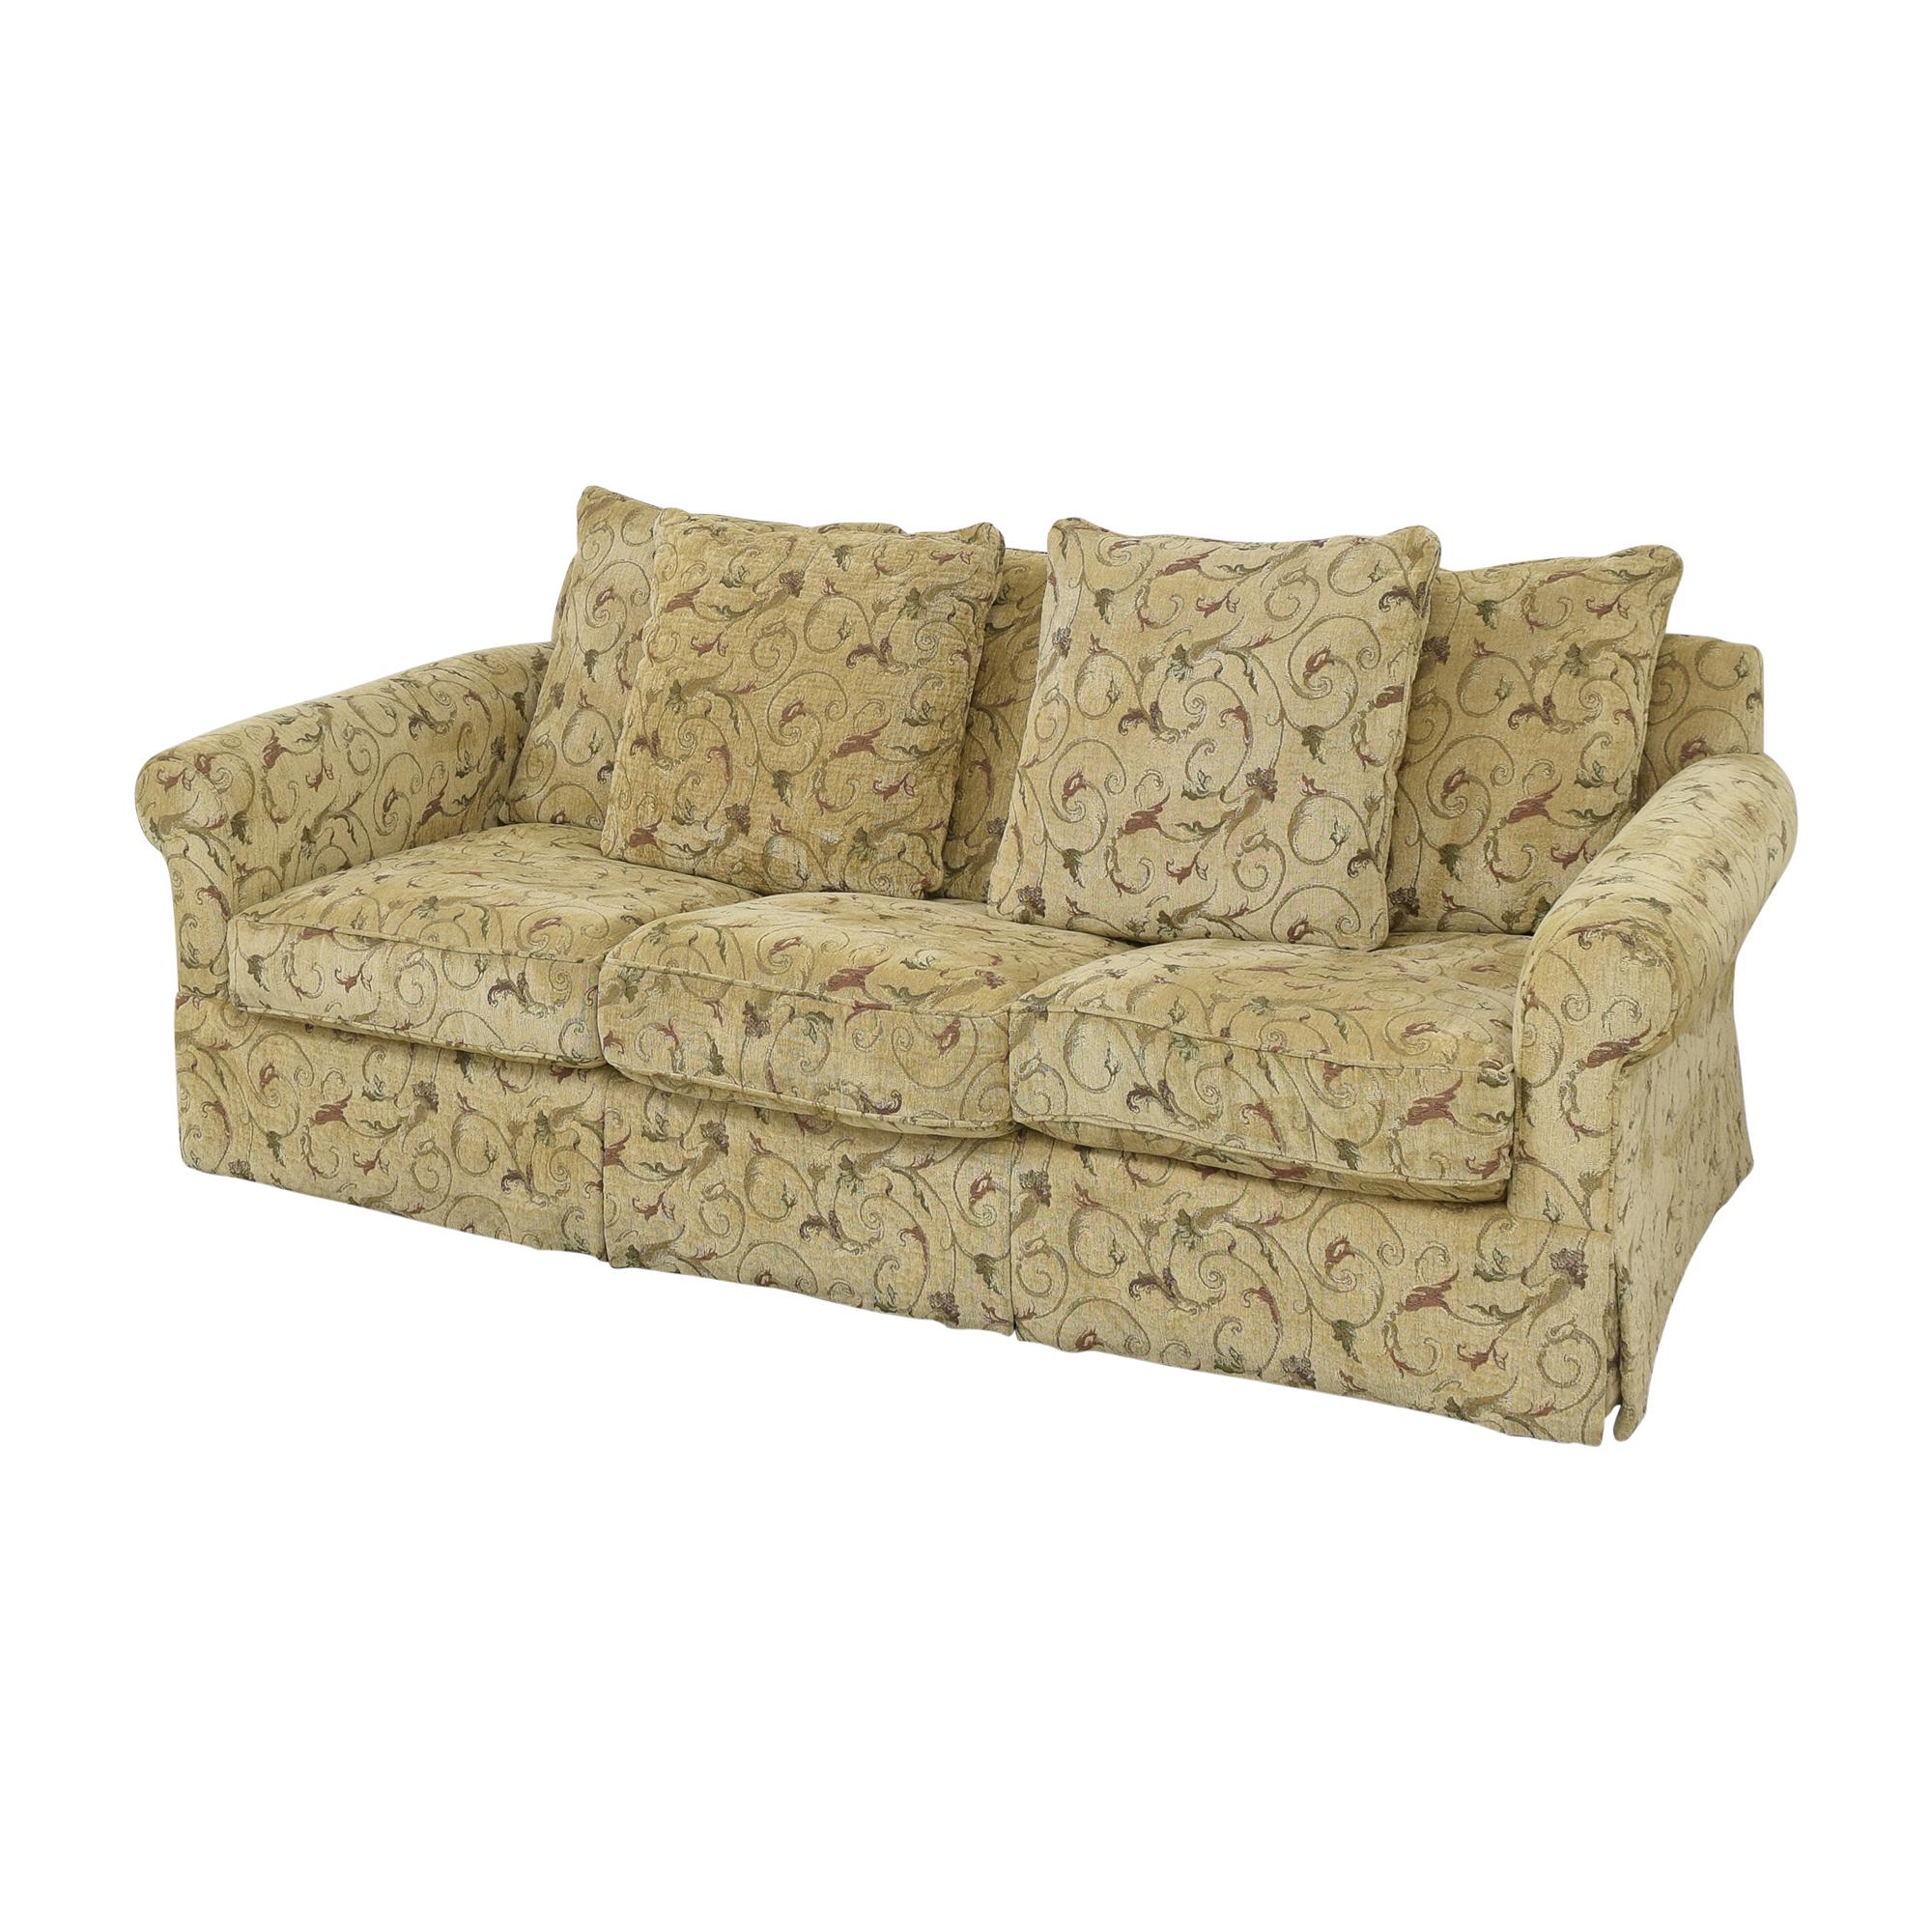 McCreary Modern McCreary Modern Sleeper Sofa nj